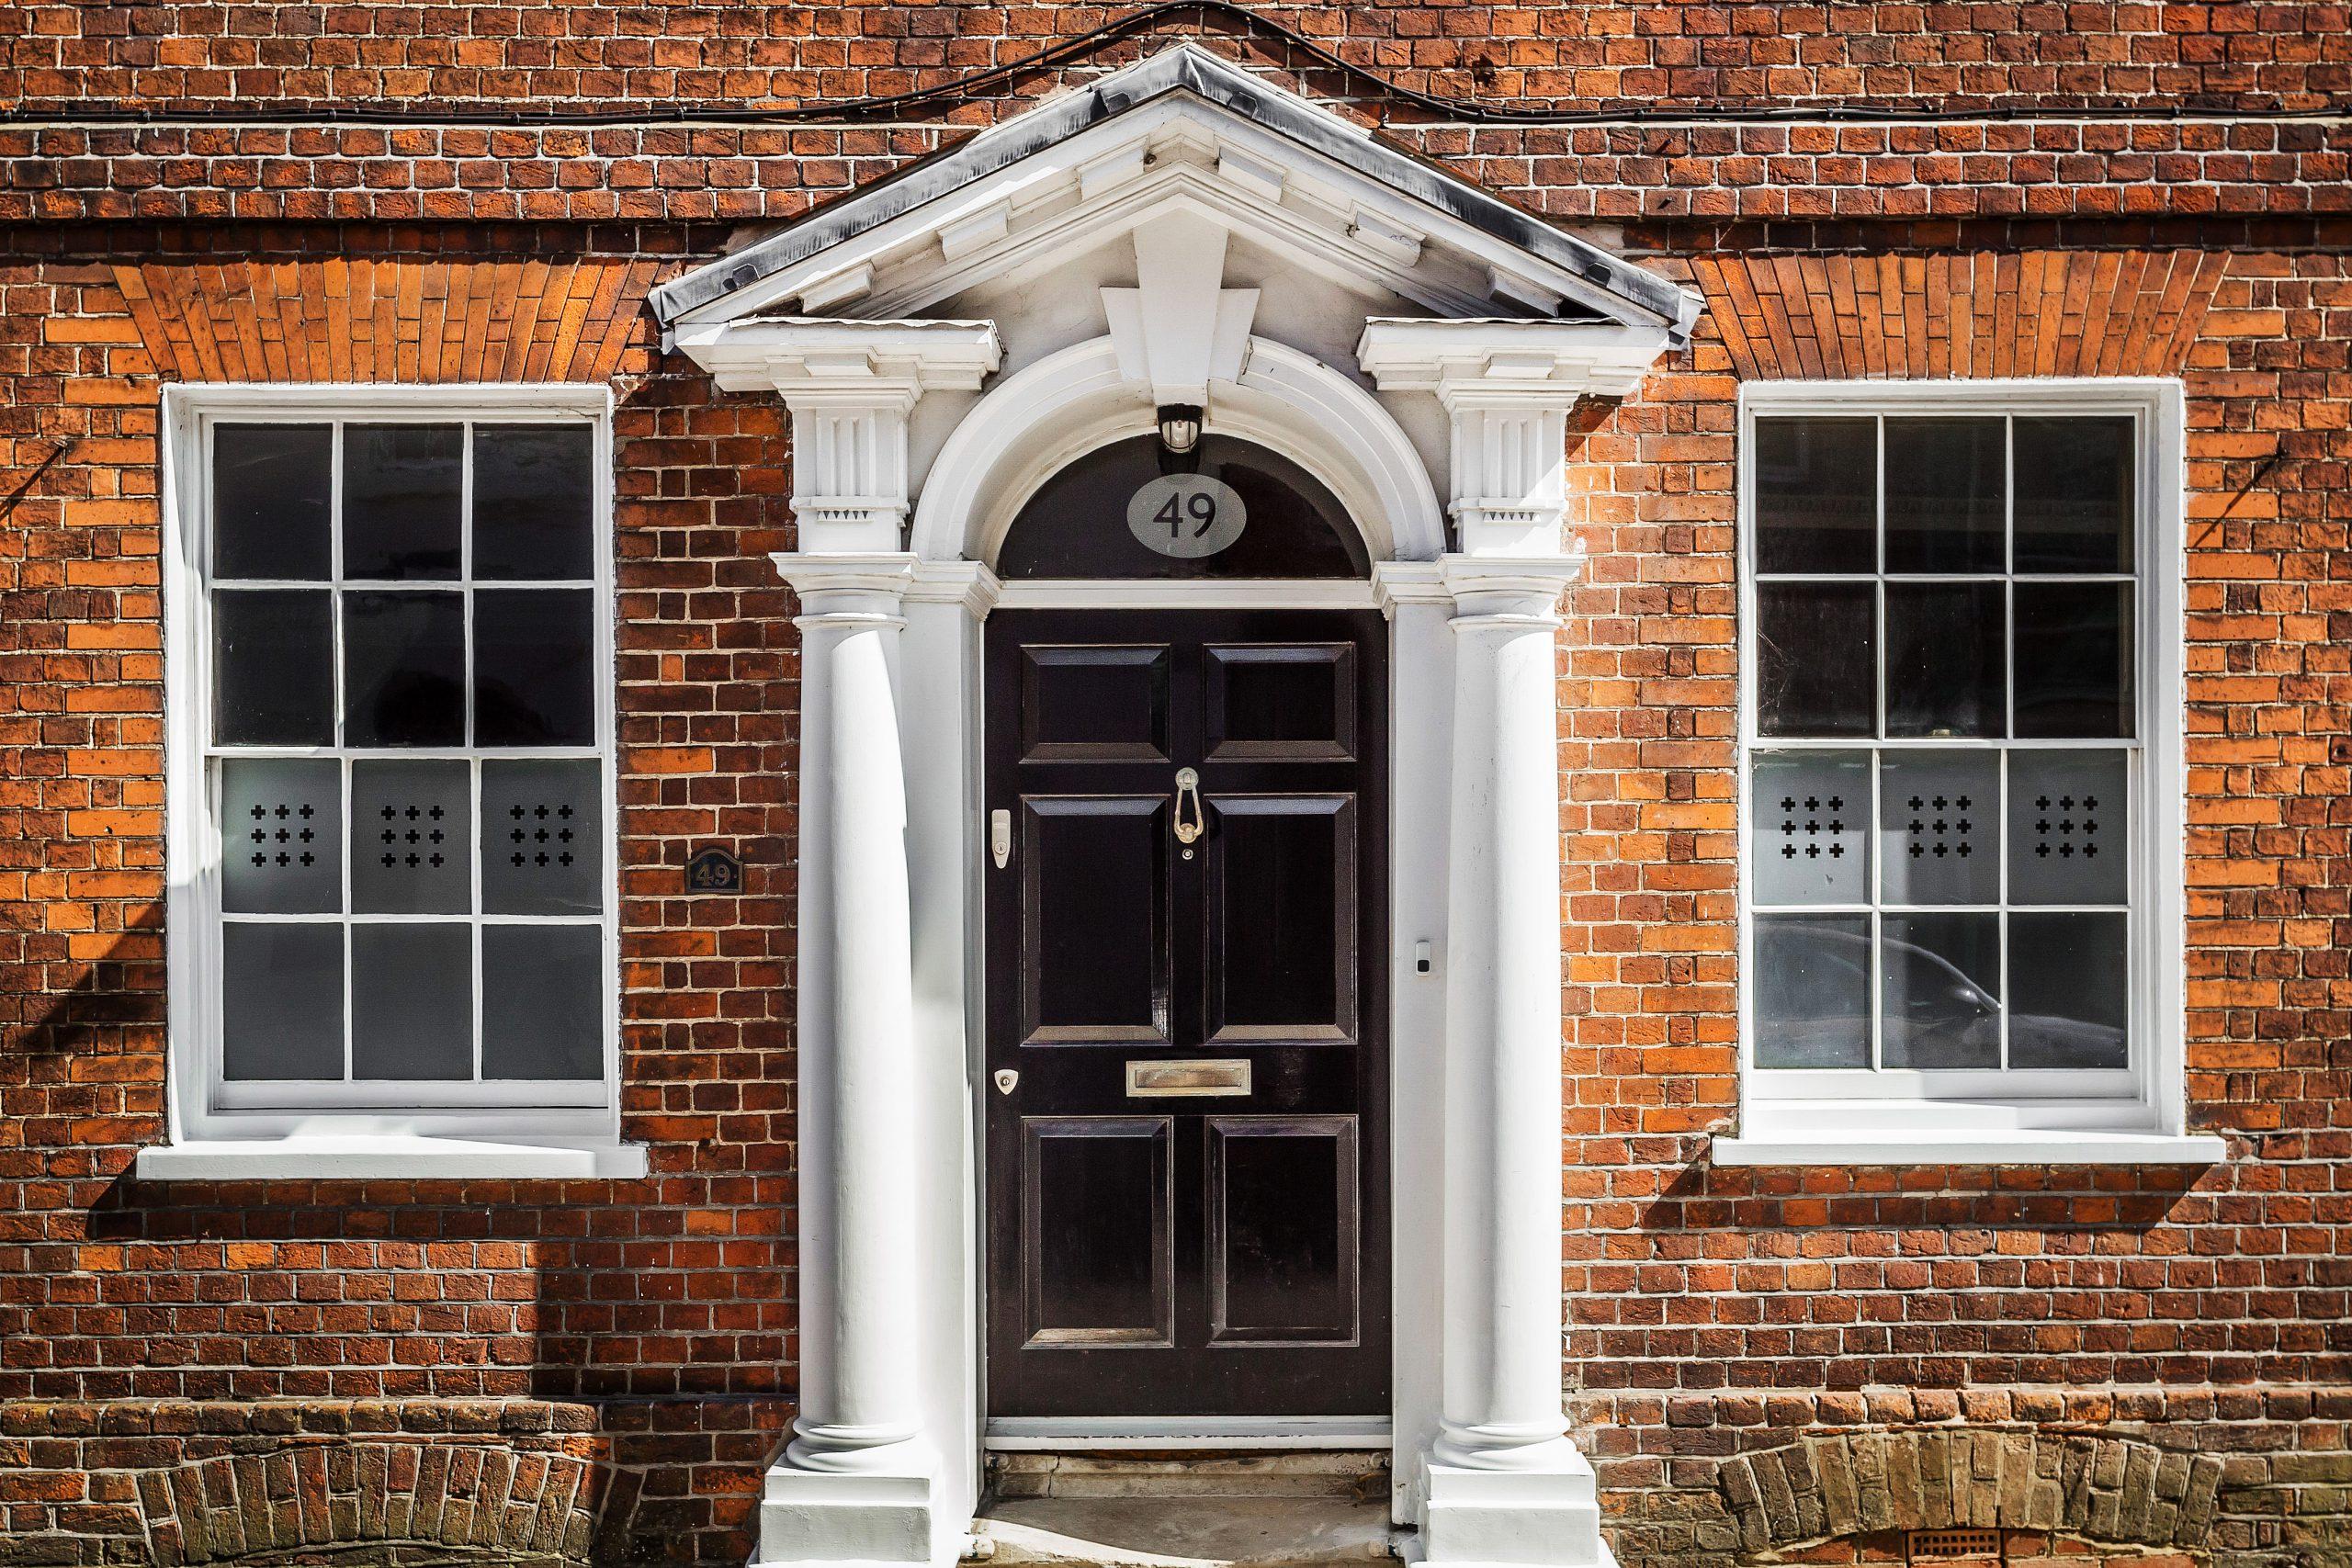 House with Black Door and Pillars